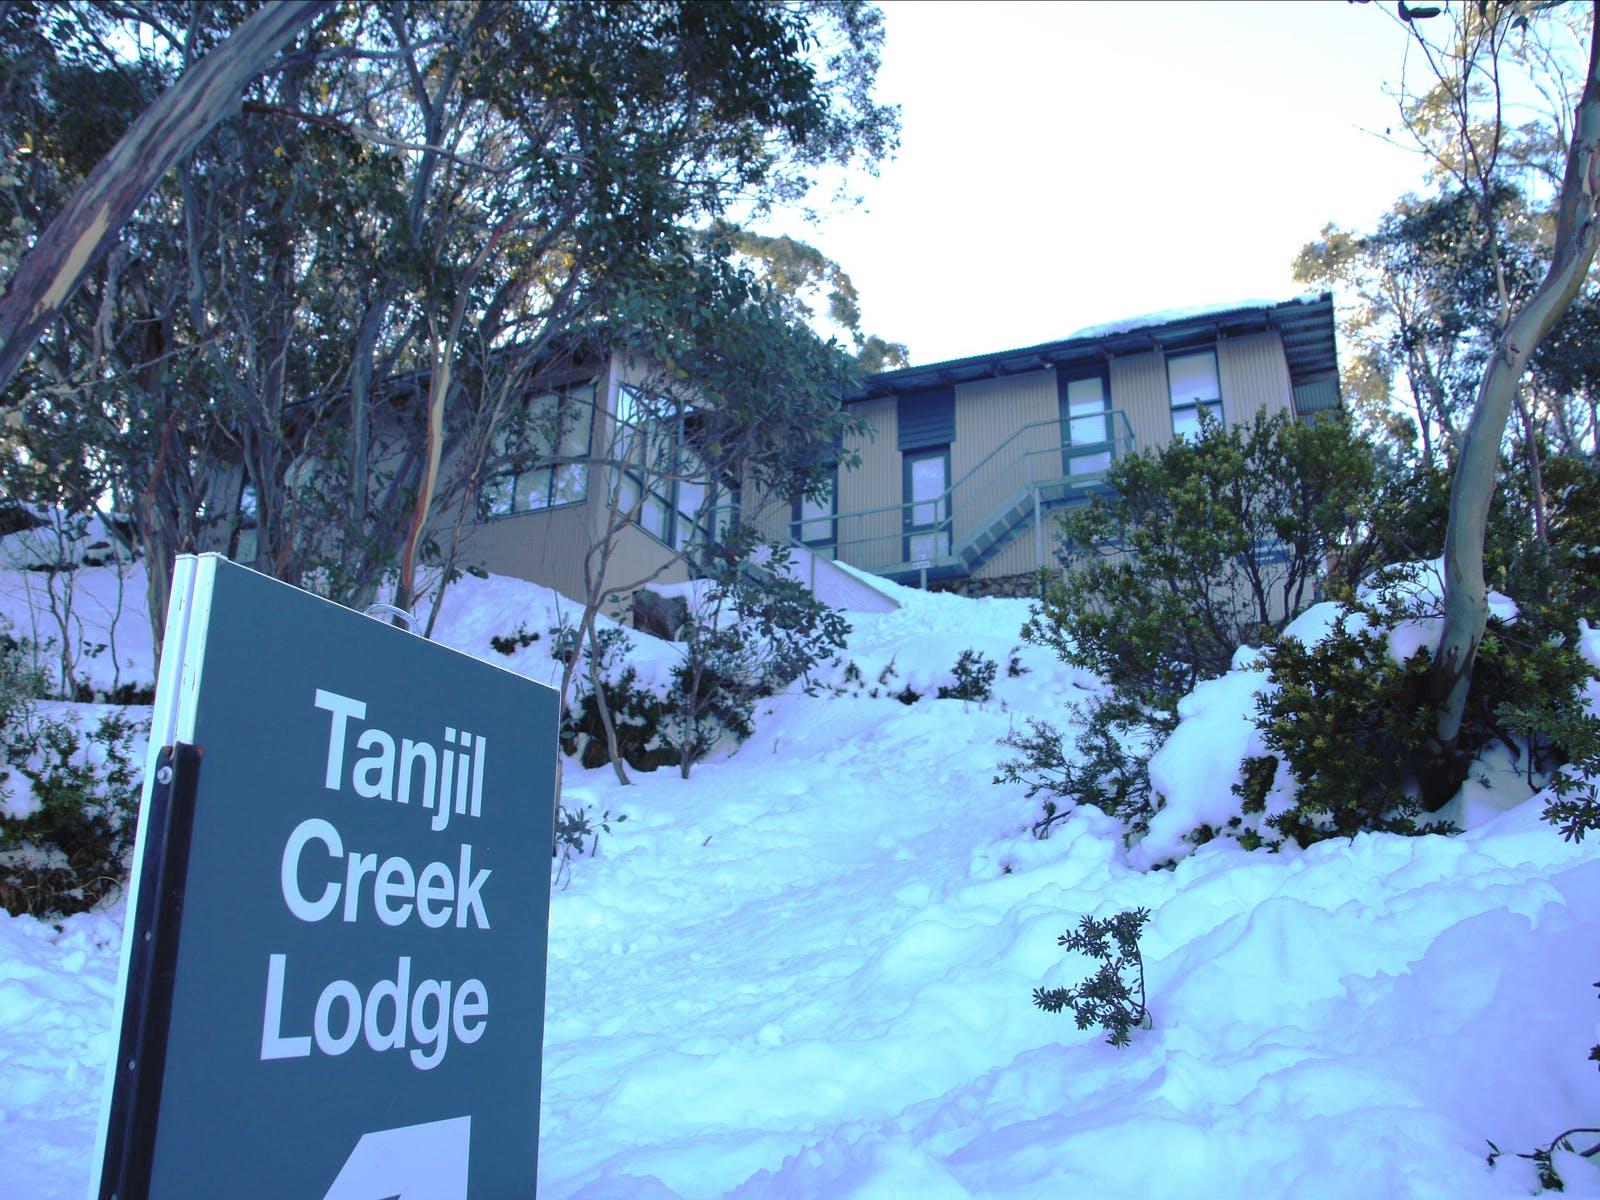 Winter wonderland atTanjil Creek Lodge Mt BawBaw